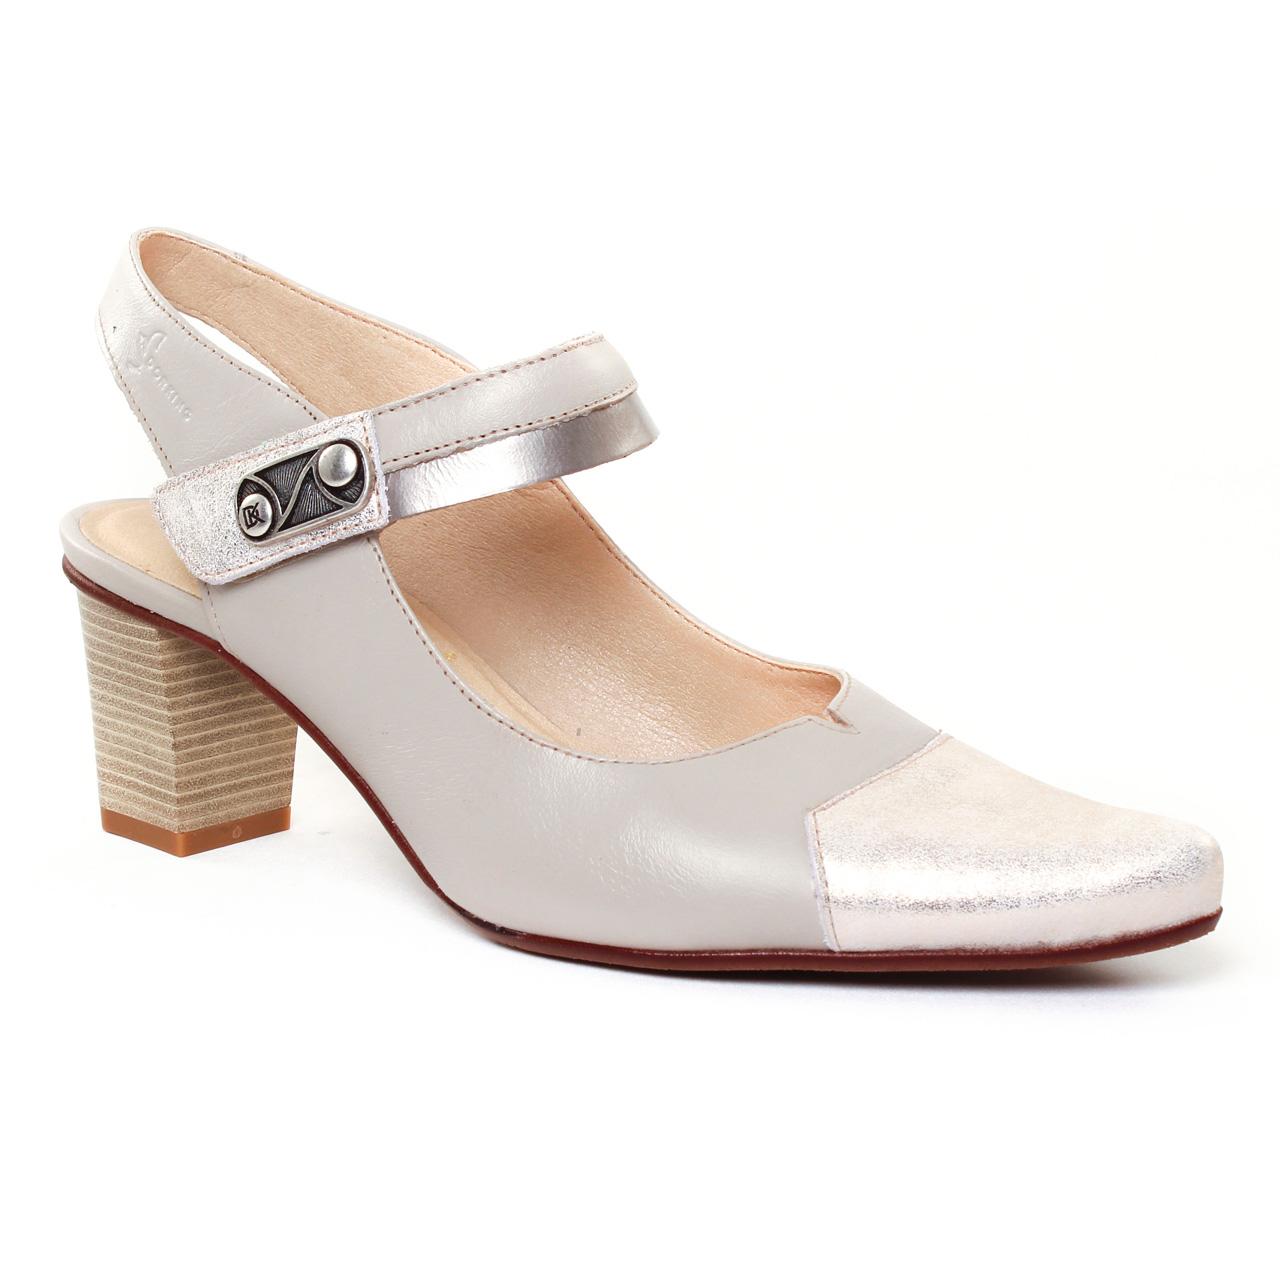 Dorking Beiges Chaussures Dorking Beiges Chaussures A89gai6 Femme twTaqvaZ